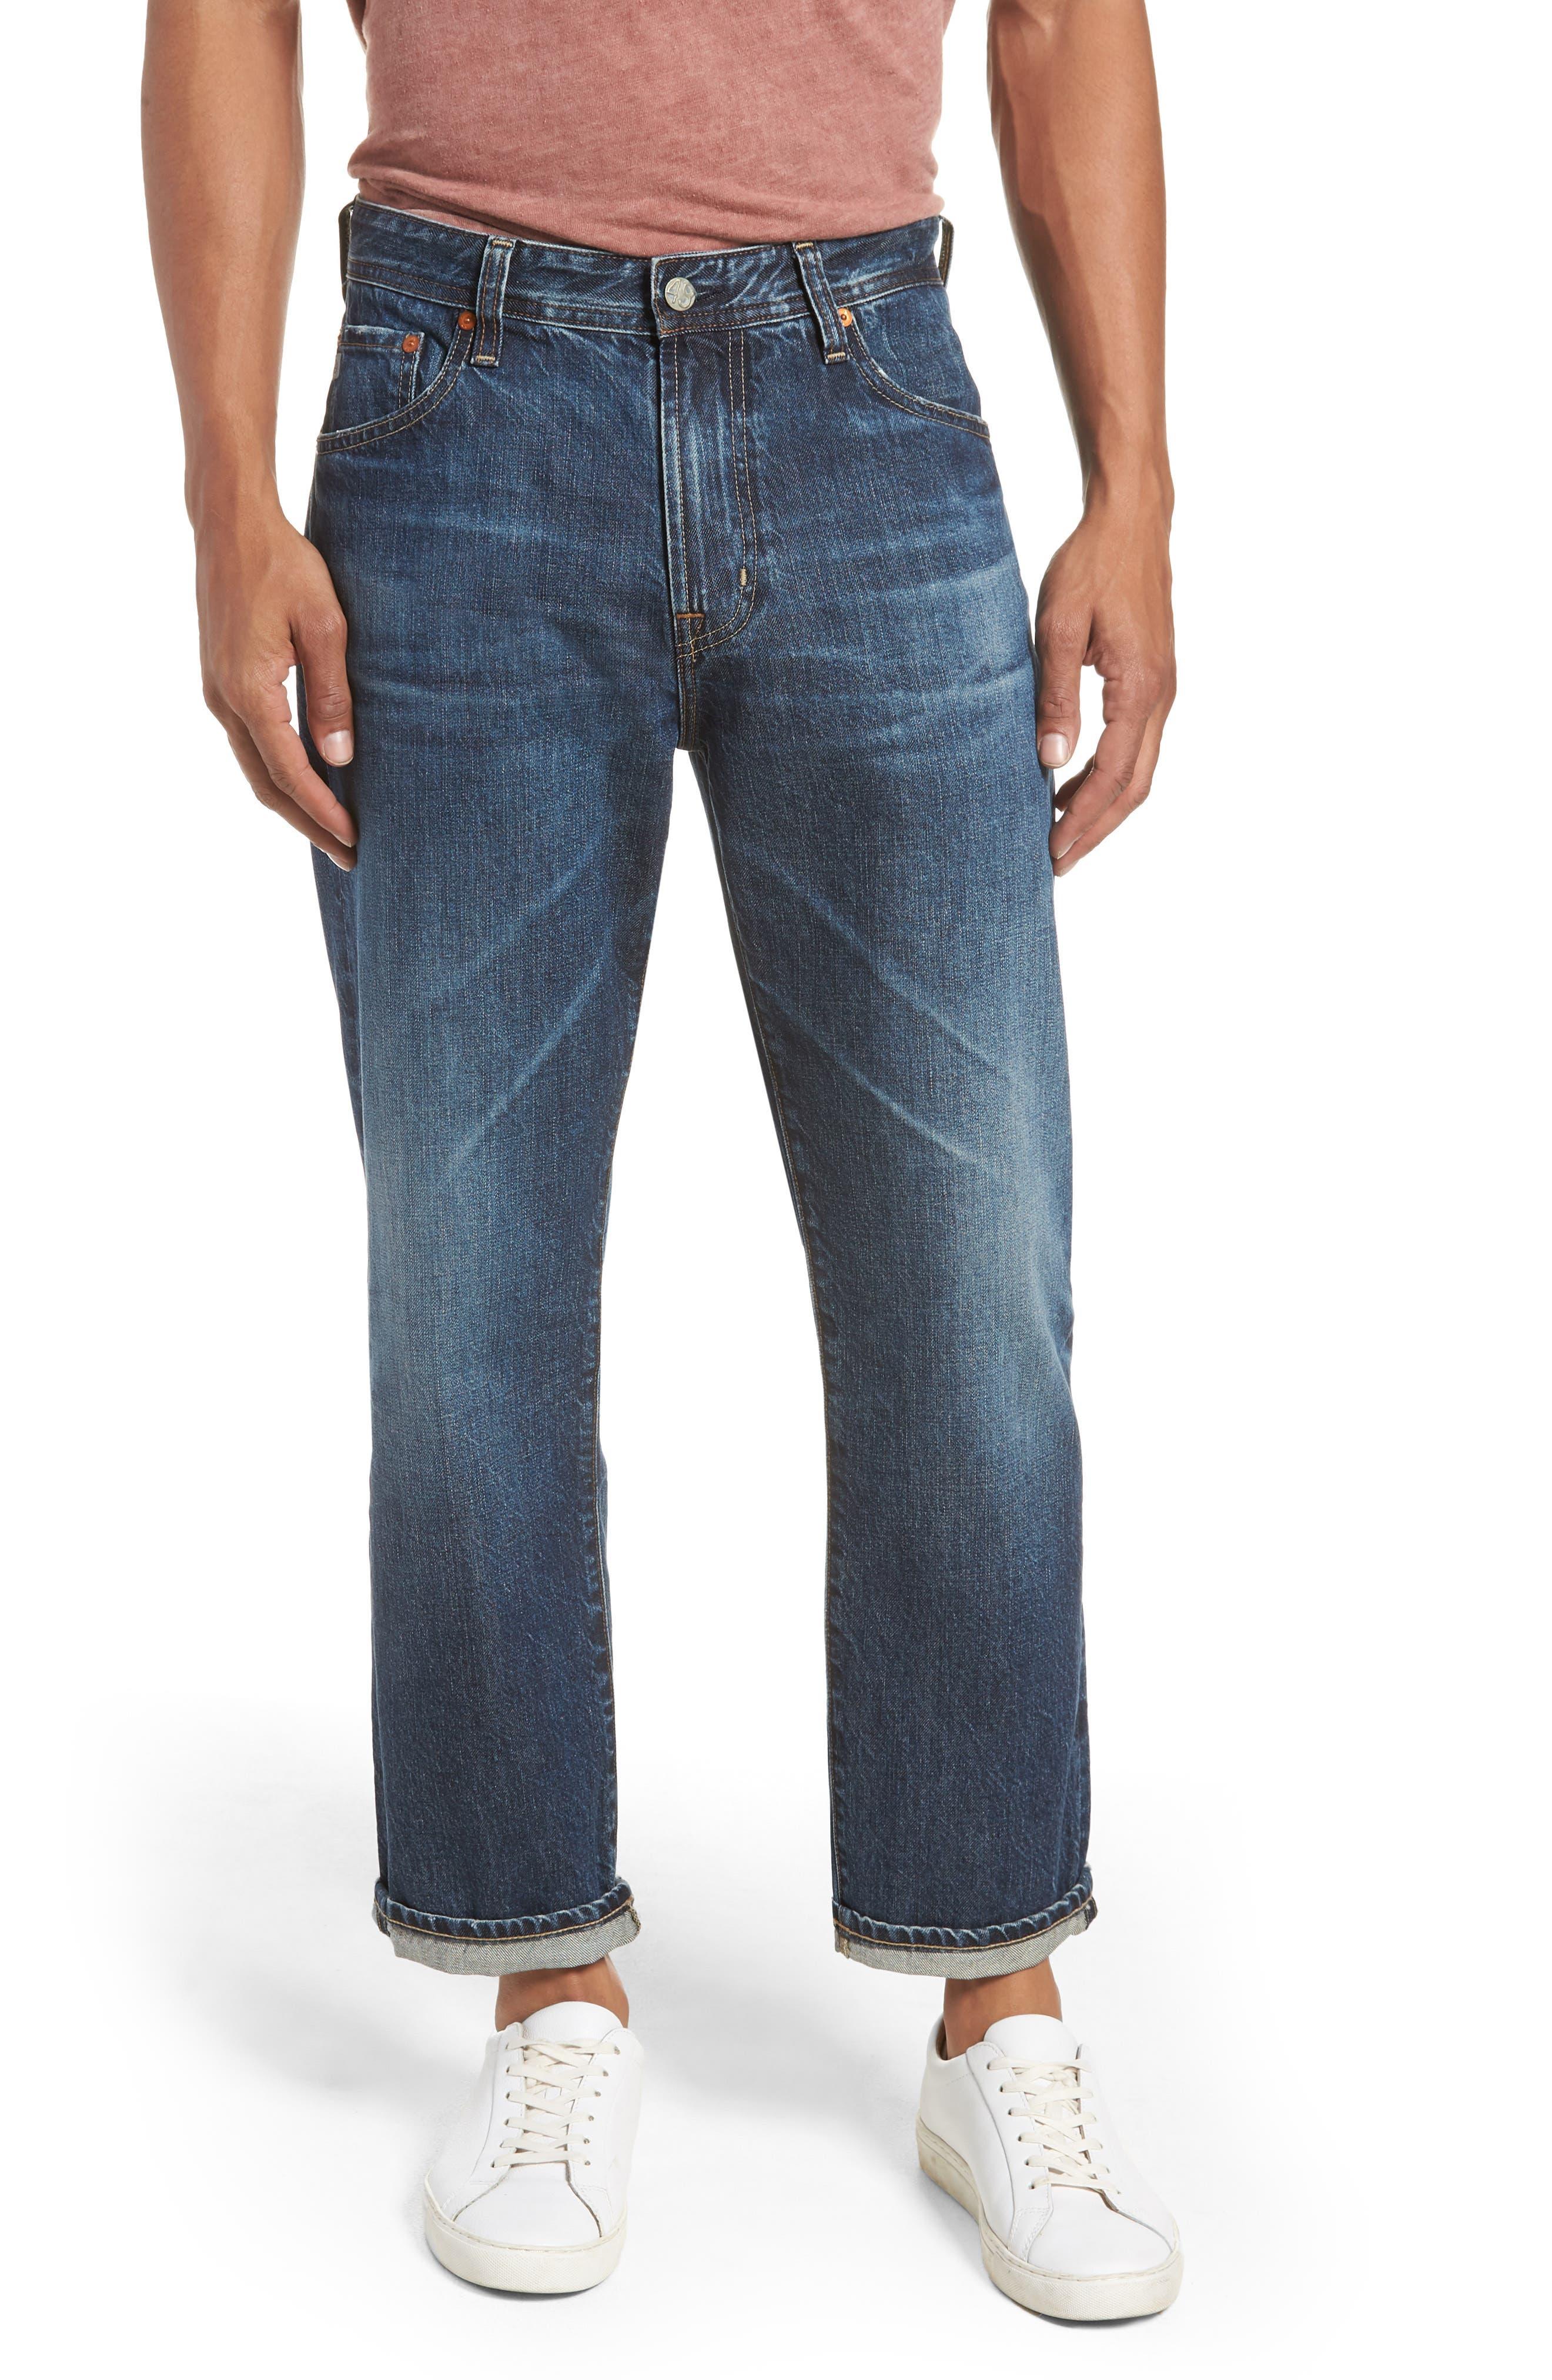 Turner Crop Jeans,                         Main,                         color, 5 YEARS WAYFARER